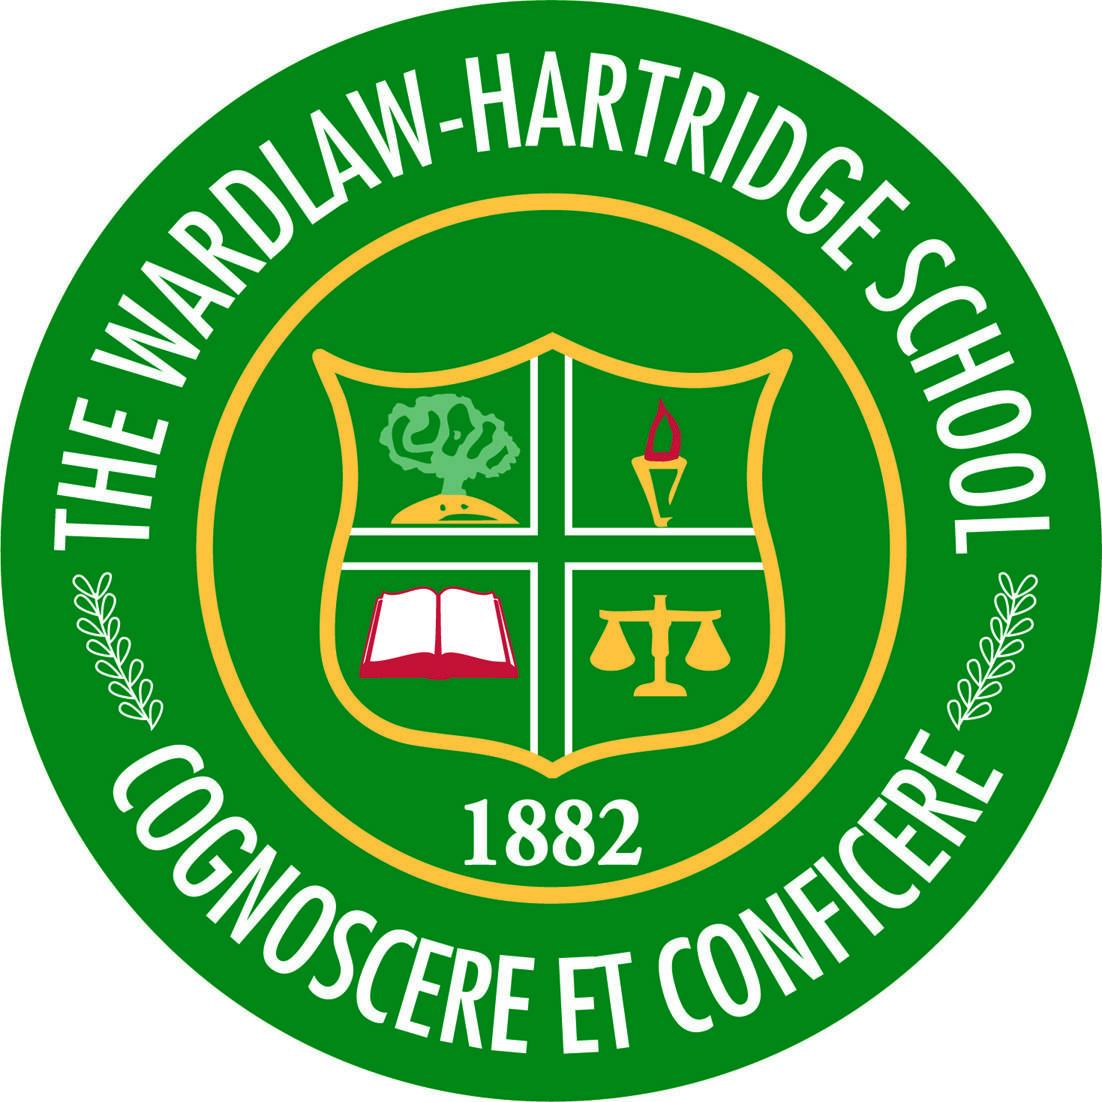 ee93578e5d6745c589ce_Wardlaw_Hartridge_logo.jpg